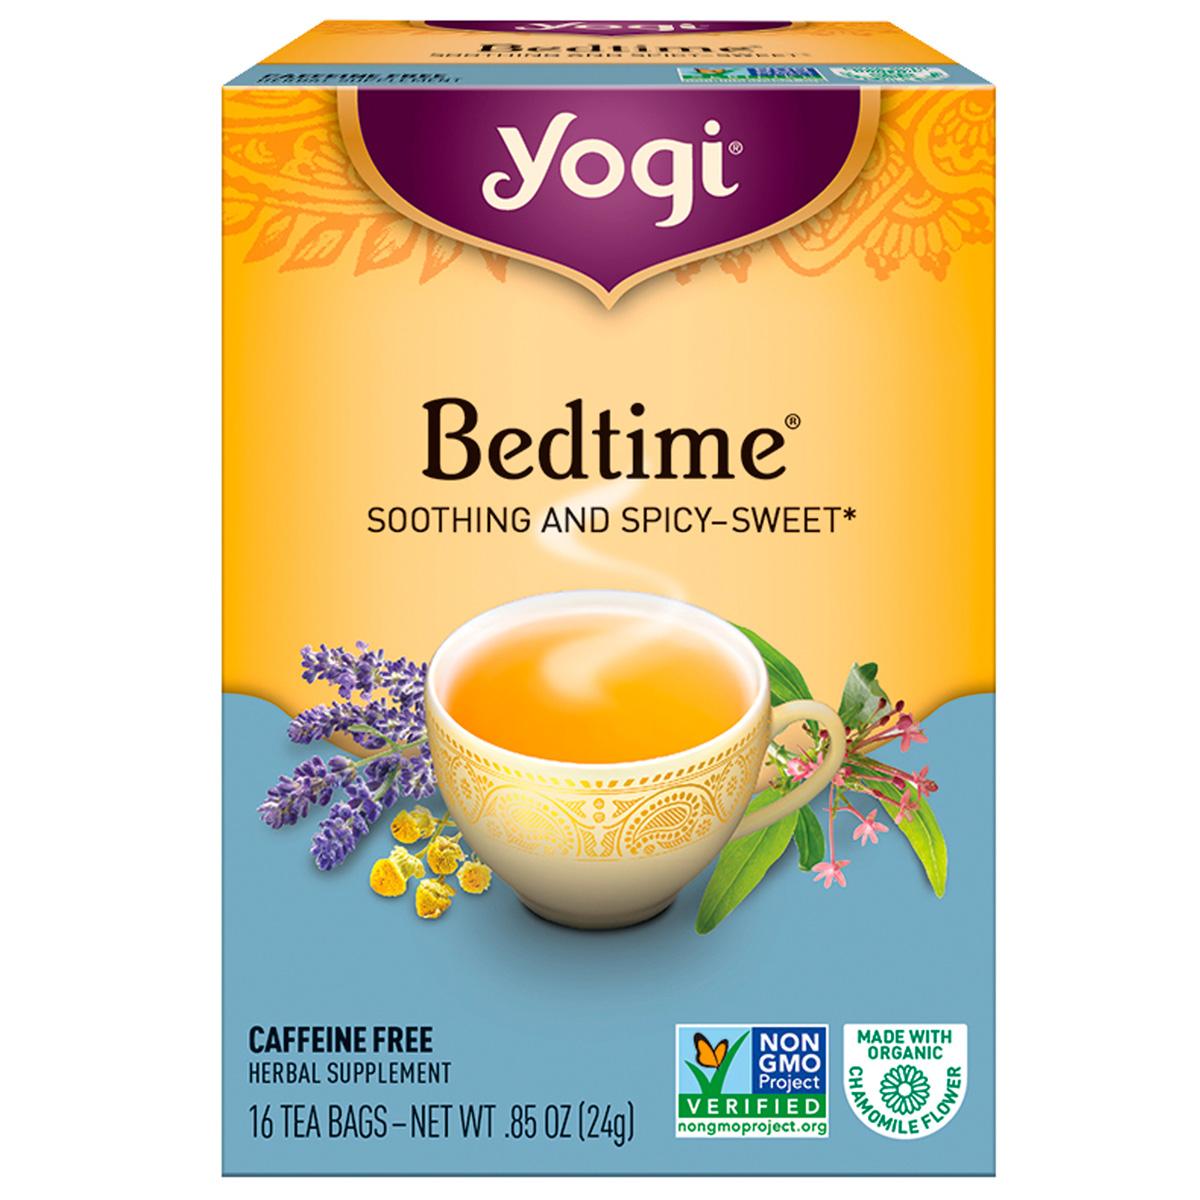 Yogi Tea Bedtime Sleep Aid 100% Natural Herbal Supplement ...